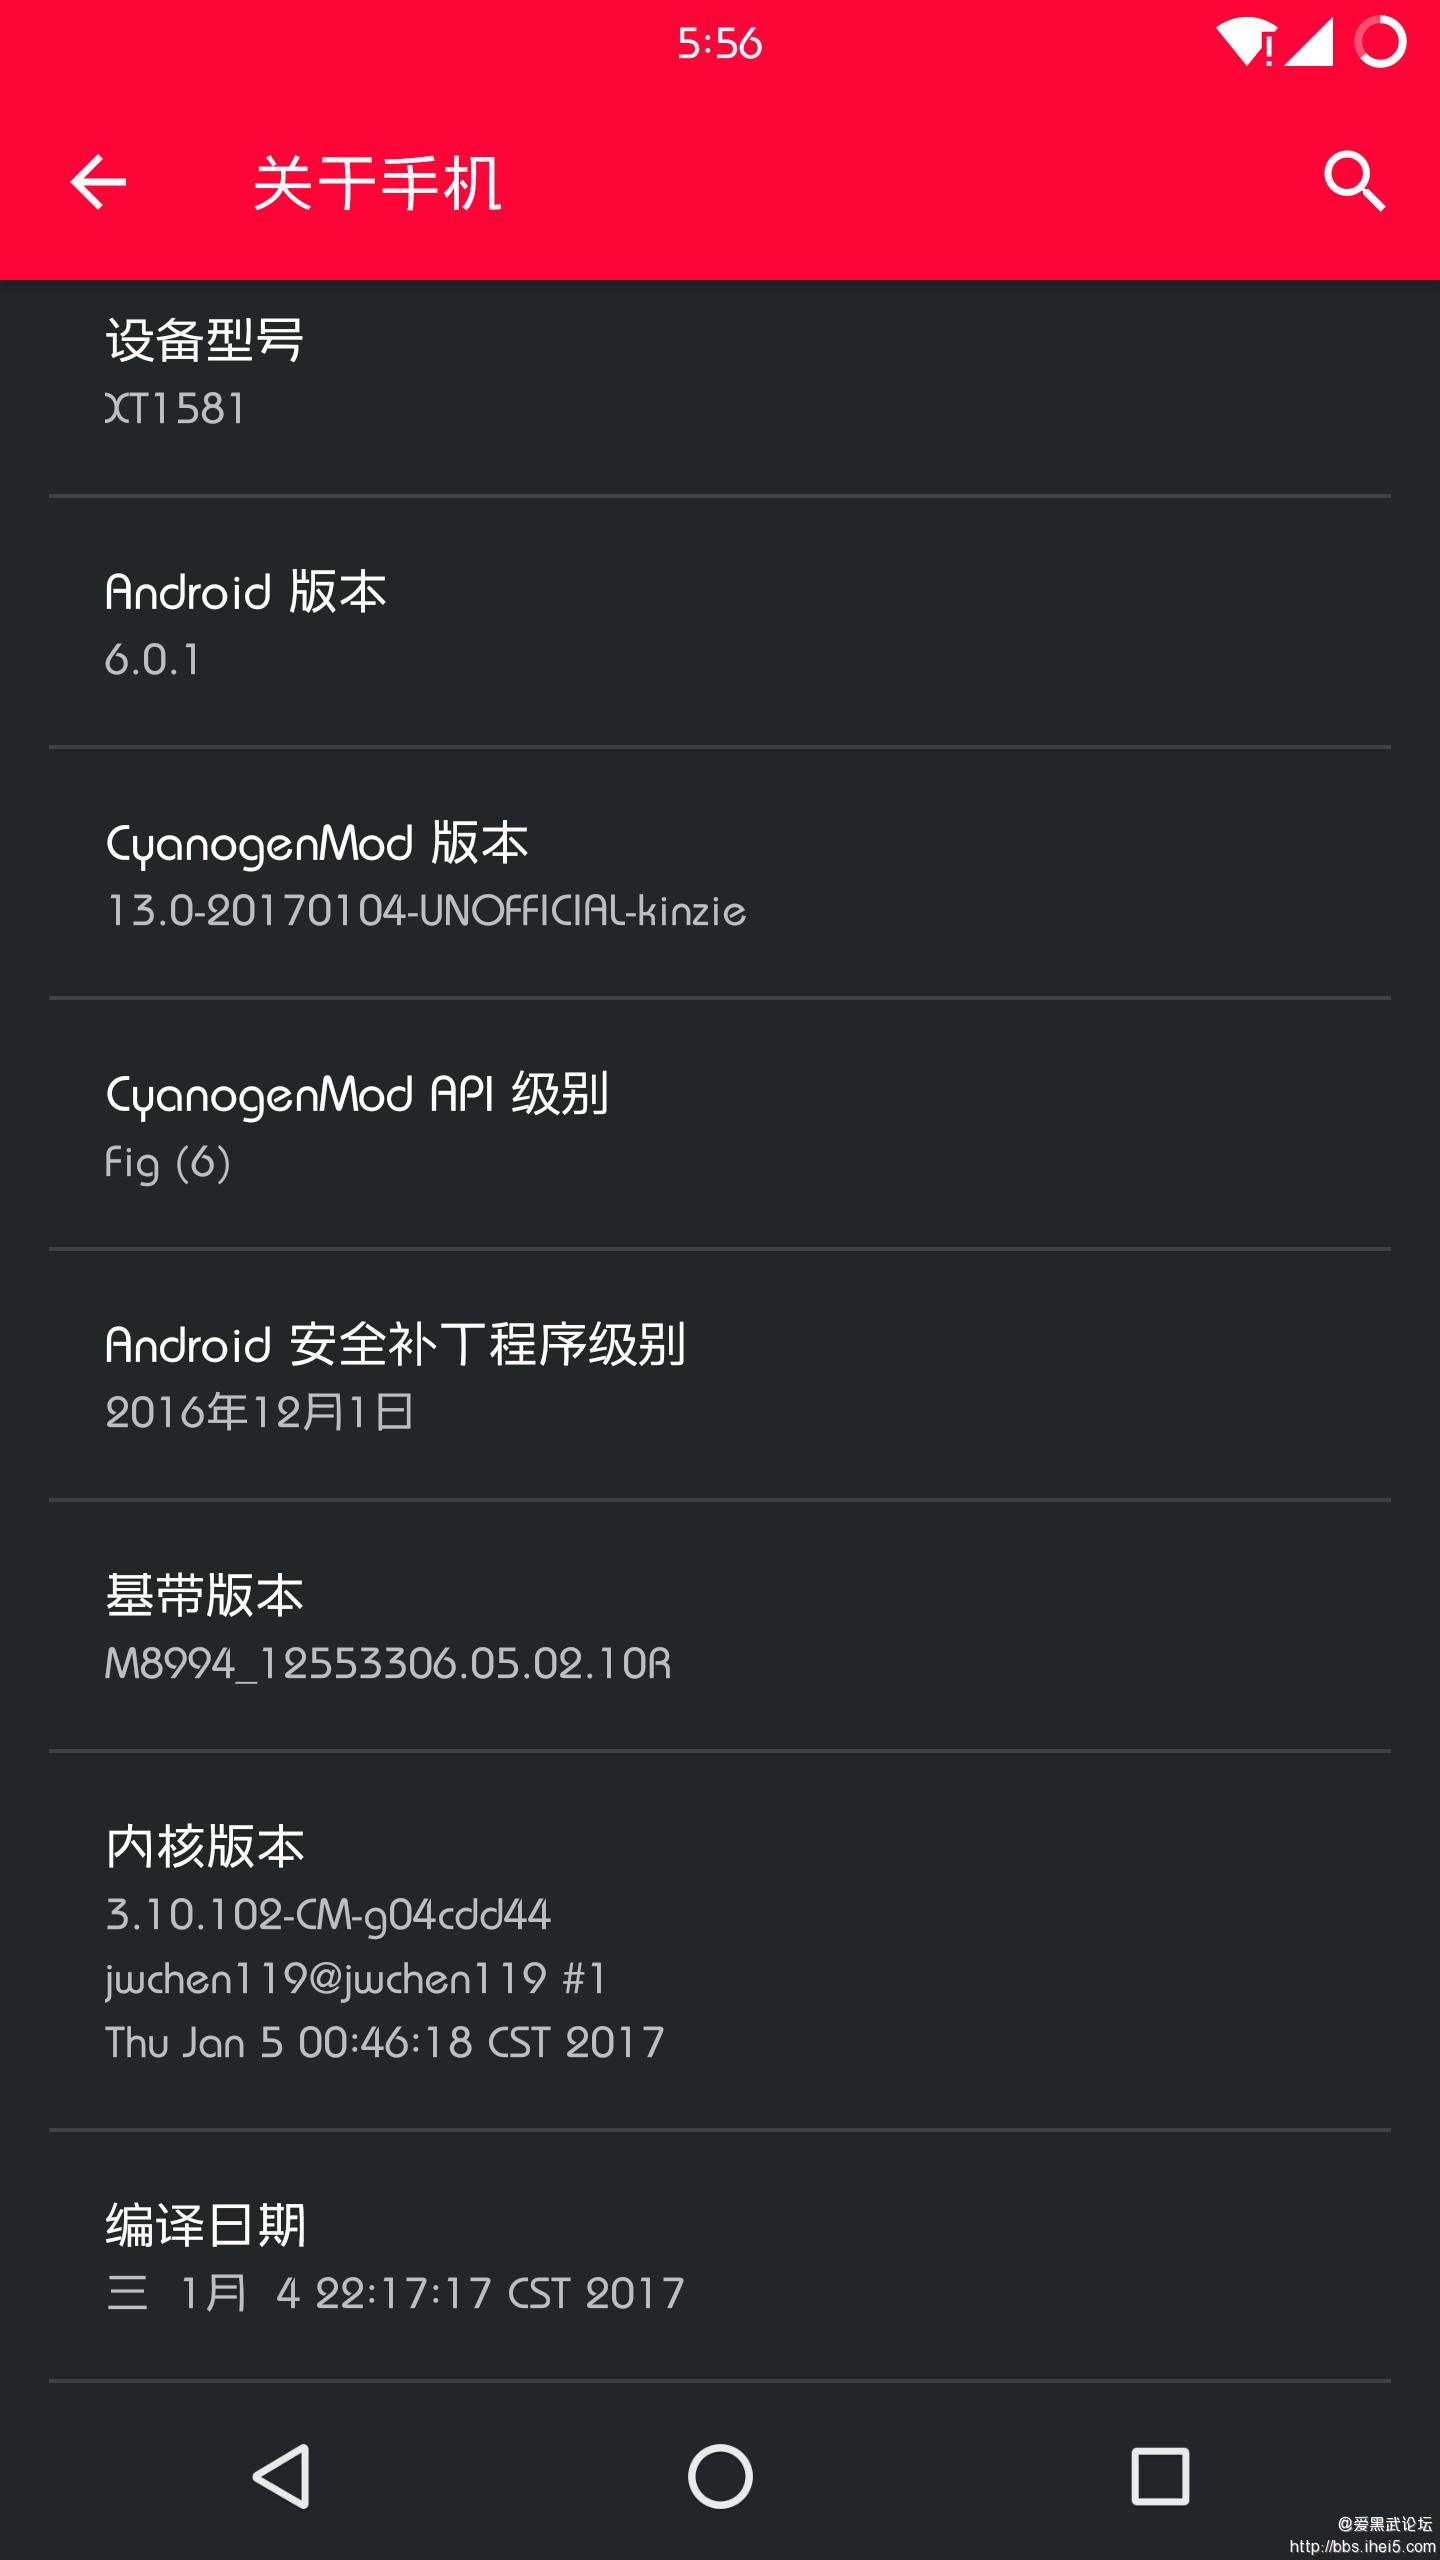 Screenshot_20170107-175627.png